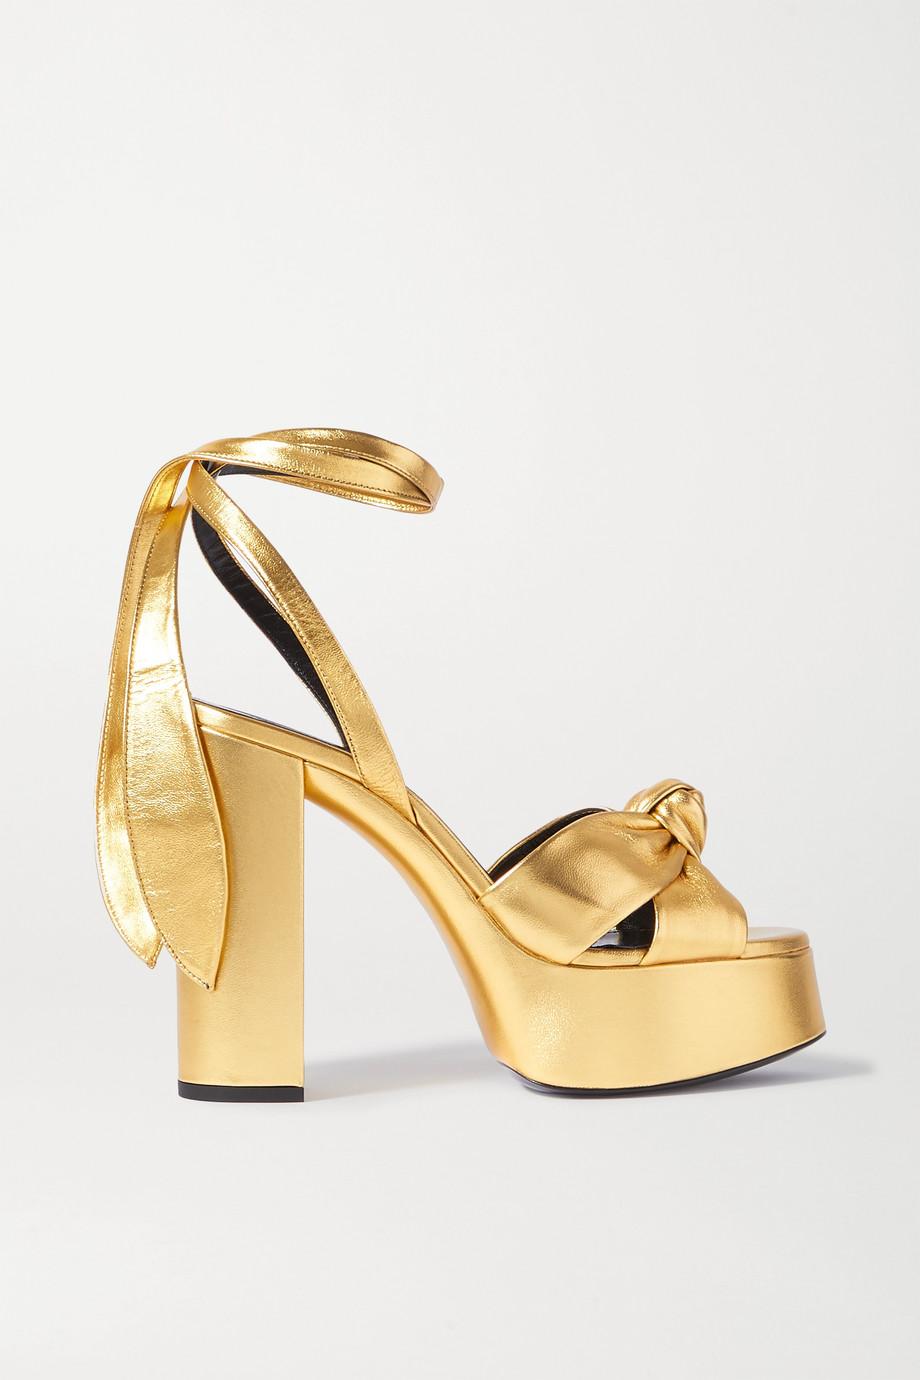 SAINT LAURENT Bianca knotted metallic leather platform sandals